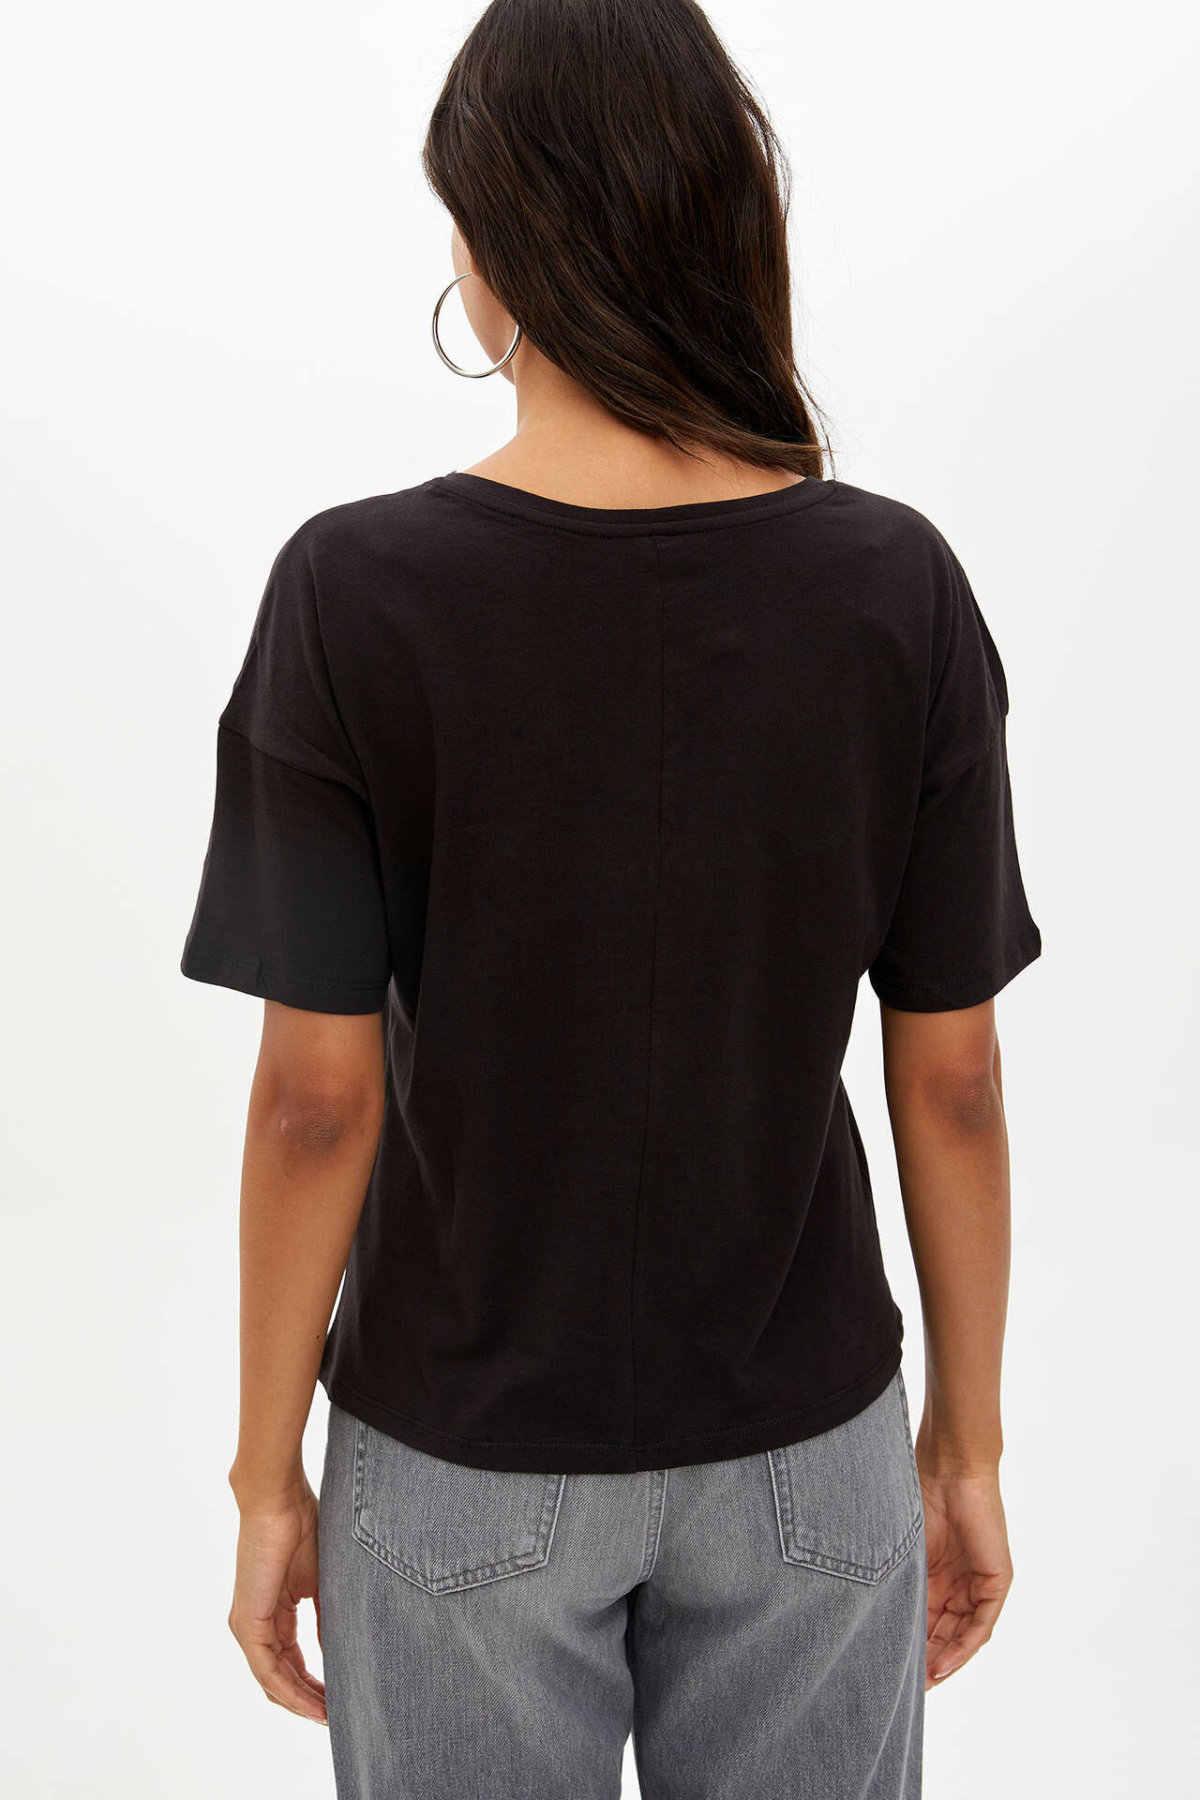 Defacto Musim Panas Wanita Lengan Pendek Leher O Surat Pola T-shirt Wanita Kualitas Tinggi Nyaman T-shirt Baru-L1873AZ19AU